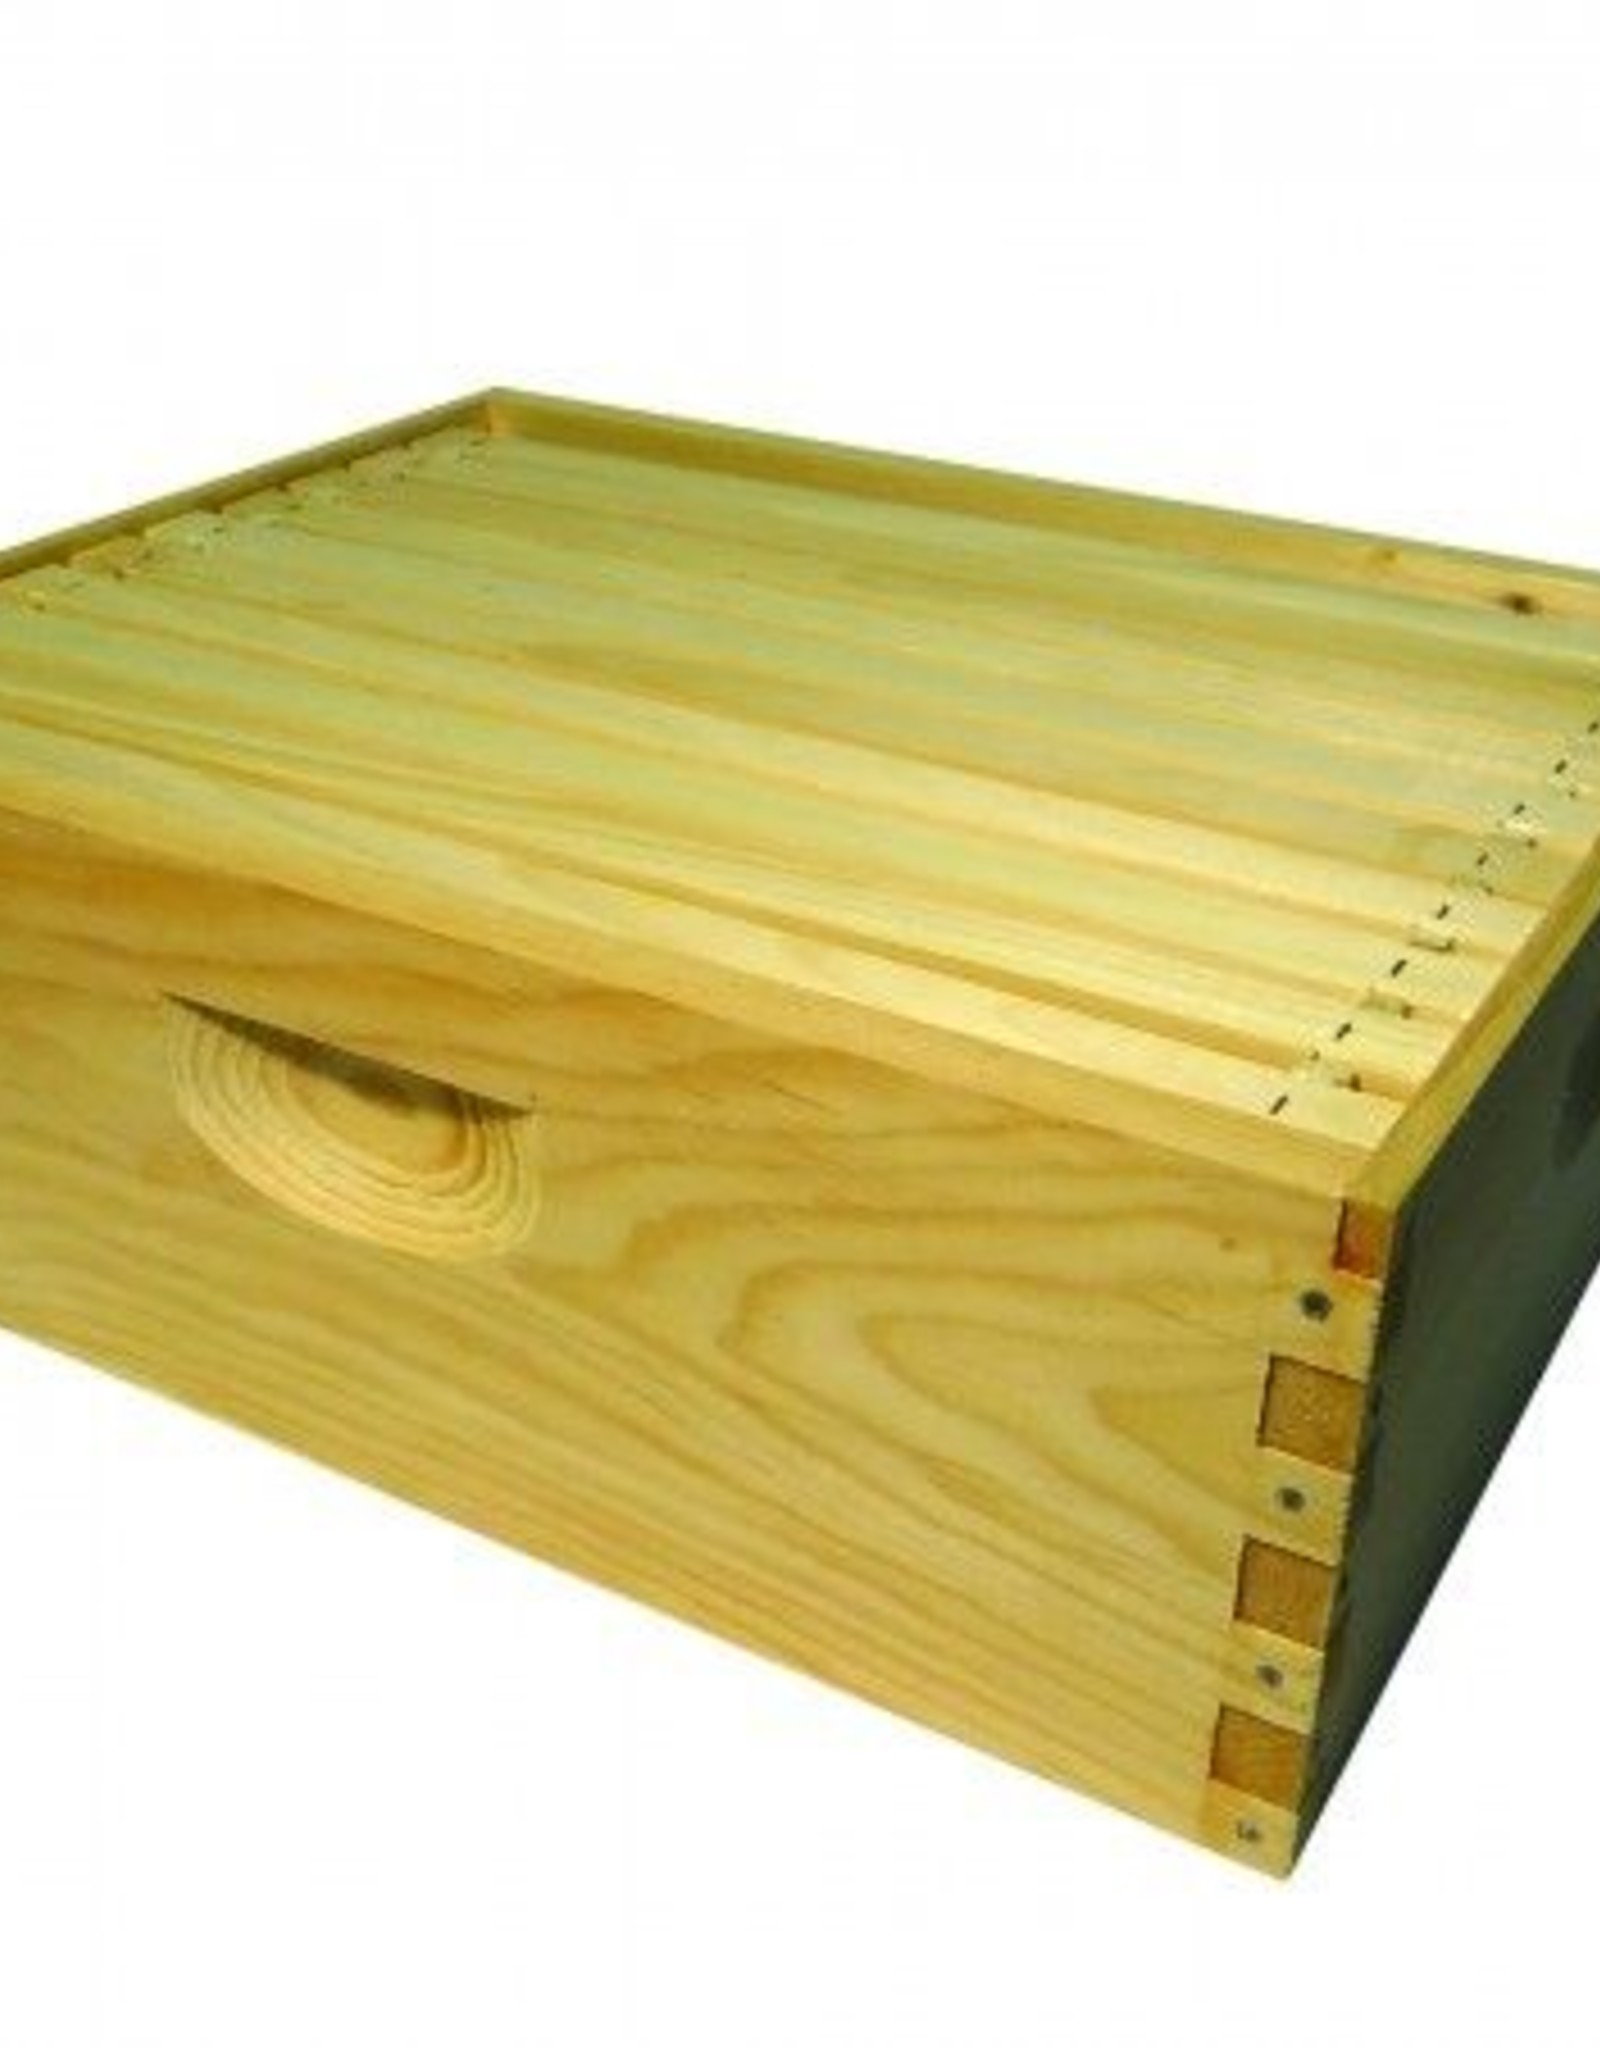 Honey & the Hive *10-Frame Shallow Super, Assembled w/ Frames & wax